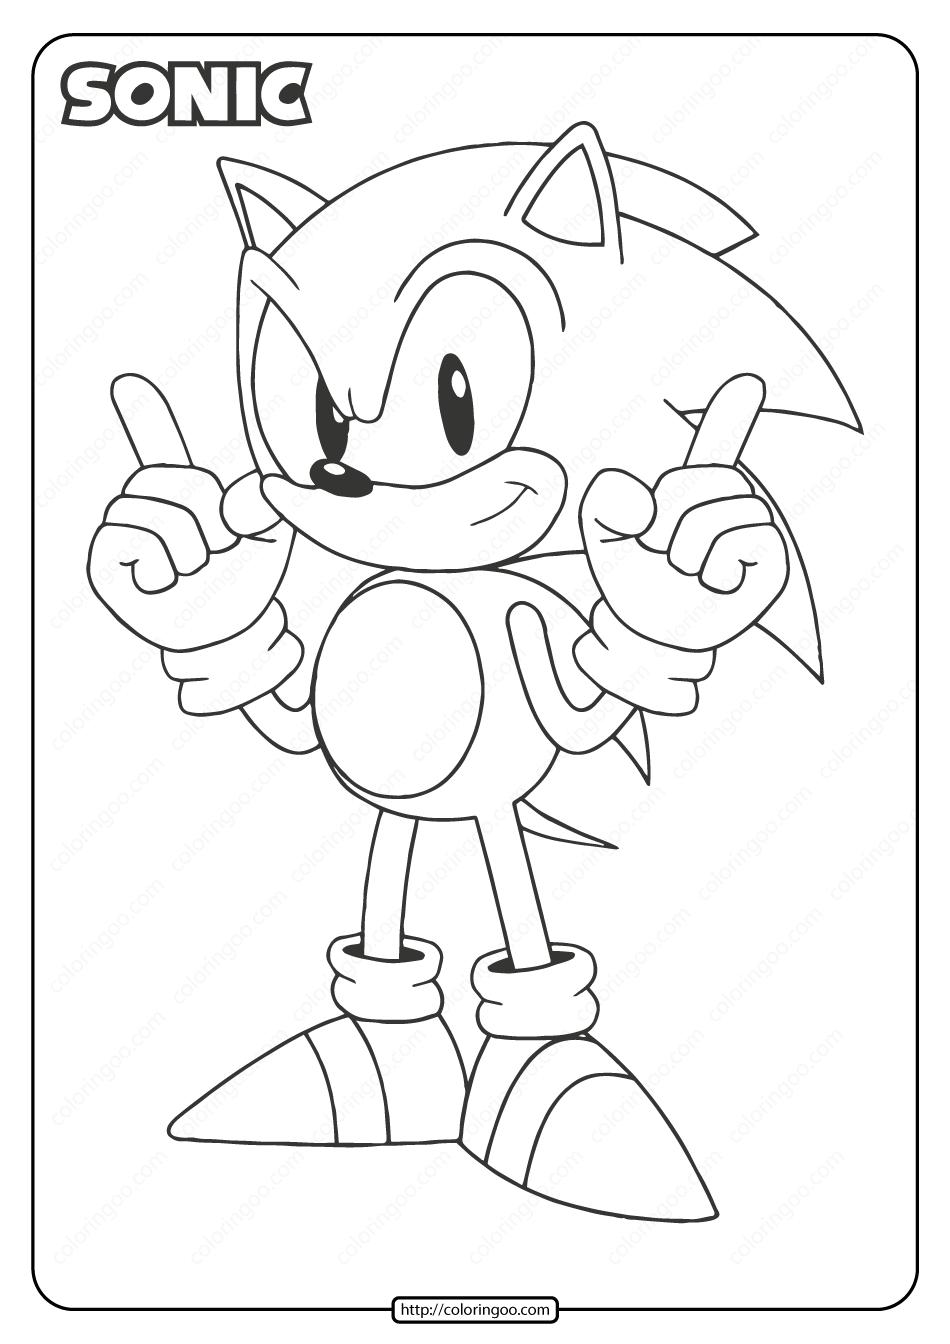 Printable Sonic Pdf Coloring Page